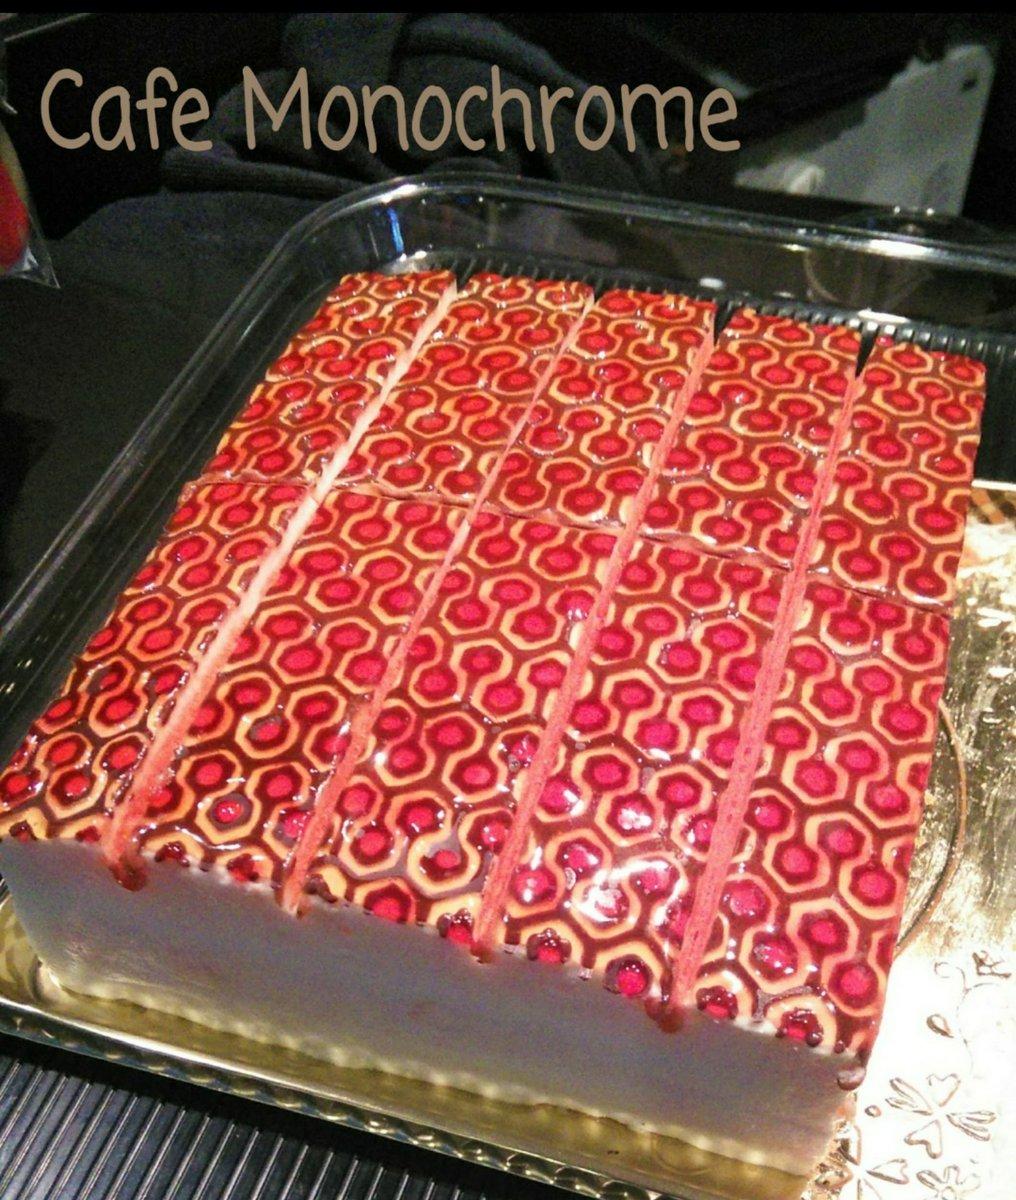 "@cafemonochrome  #MonochromeDay Over Look Cakeの全貌は絨毯模様もさることながら、側面にしたたる血のようなホラー感が光る!!  お店でいただいたときの写真を探してみたら、ベルク郎さん&ヘテさん @bellkuro @tenaga_axinaga 出版の ""TWIN PEAKS Zine""が一緒に!!  この頃だったんね(〃∇〃)pic.twitter.com/cgpIrdHH77"